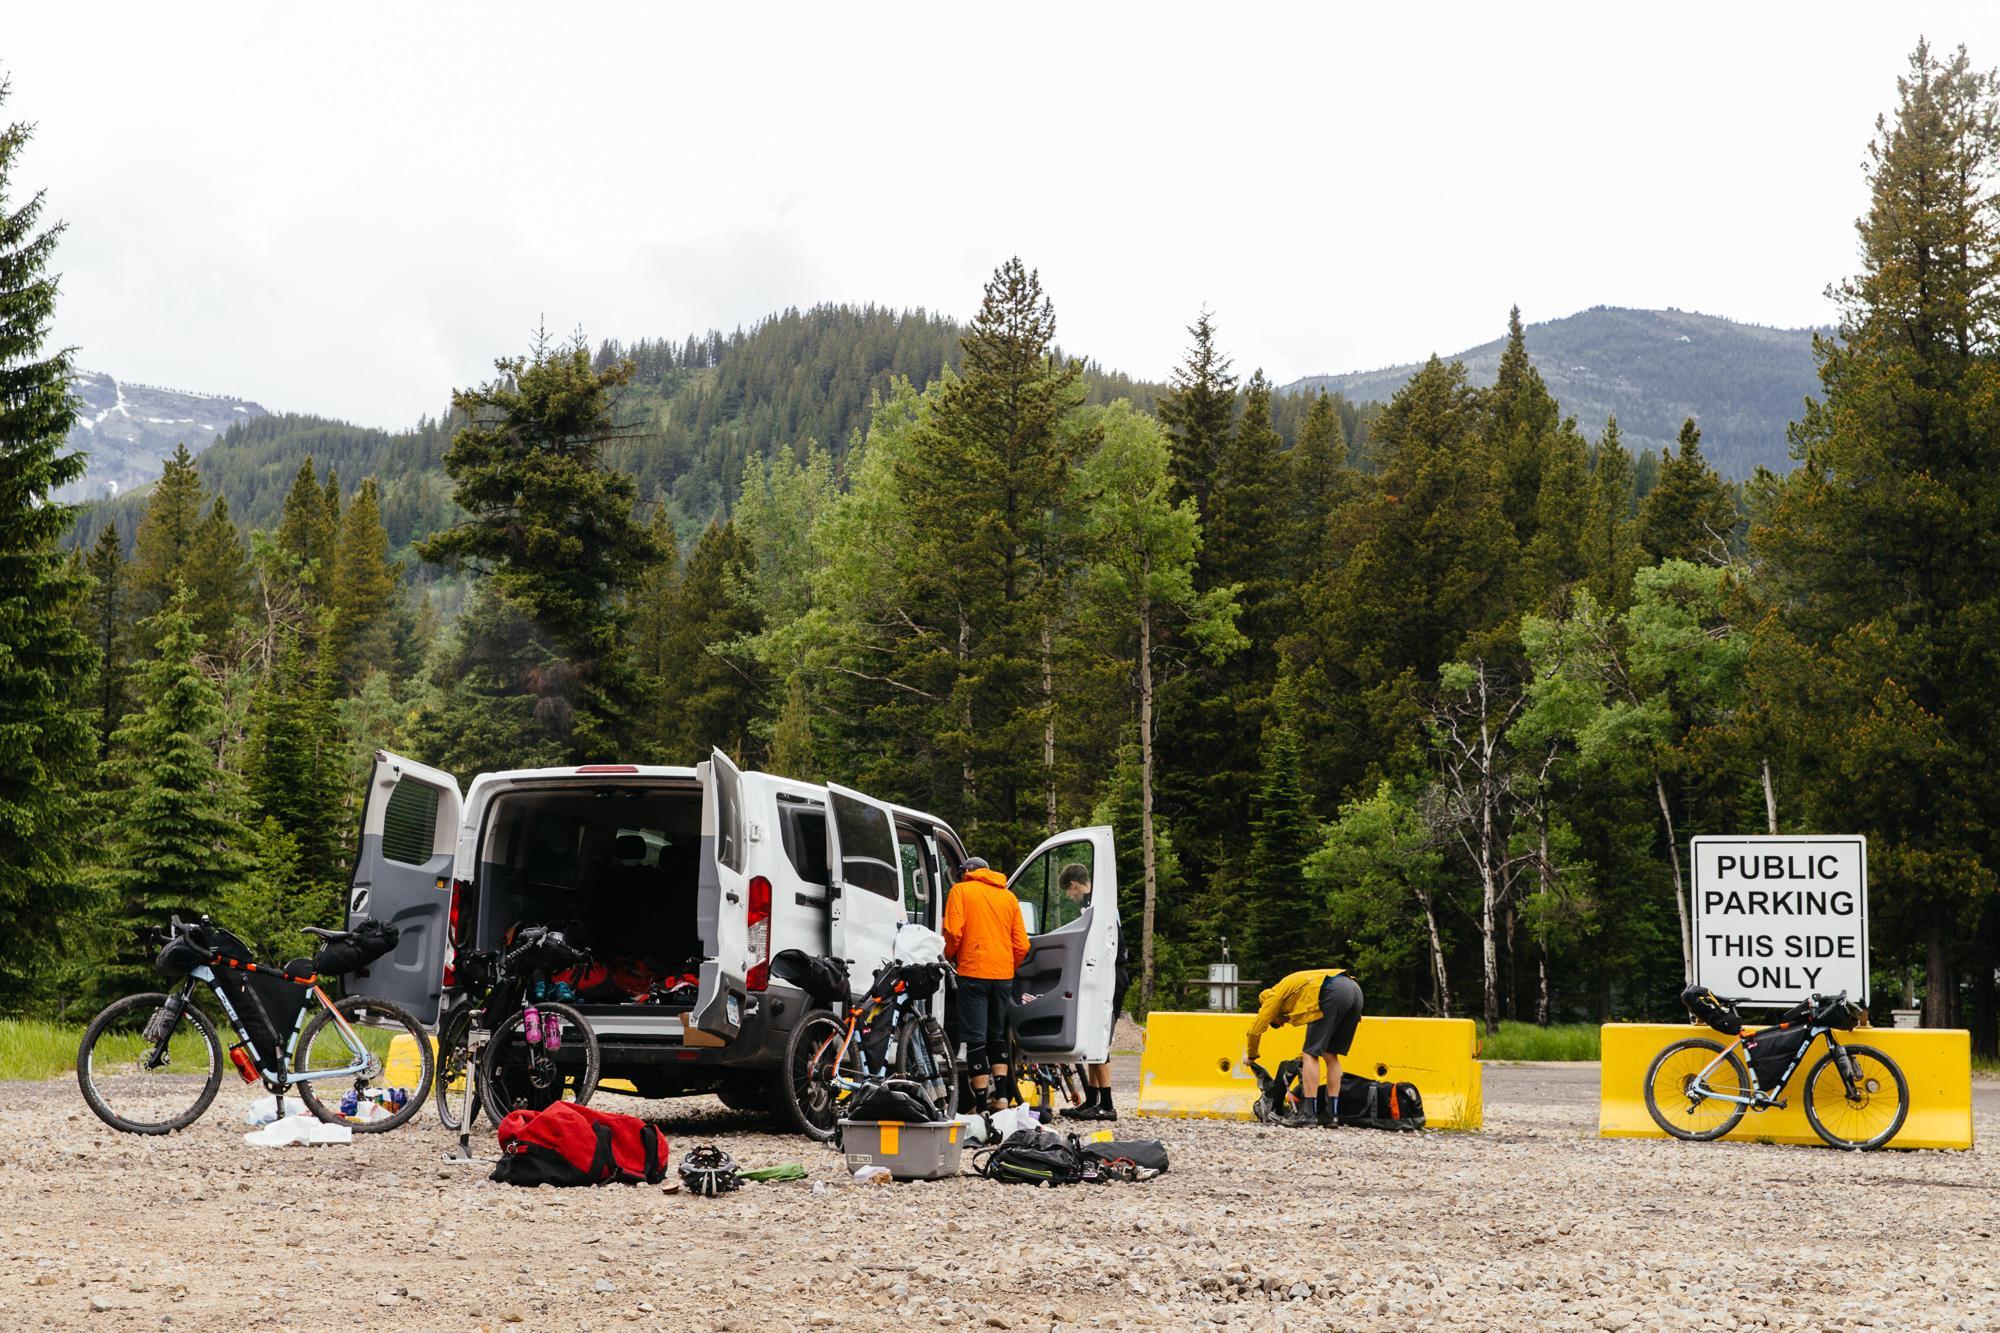 Van and bike explosion